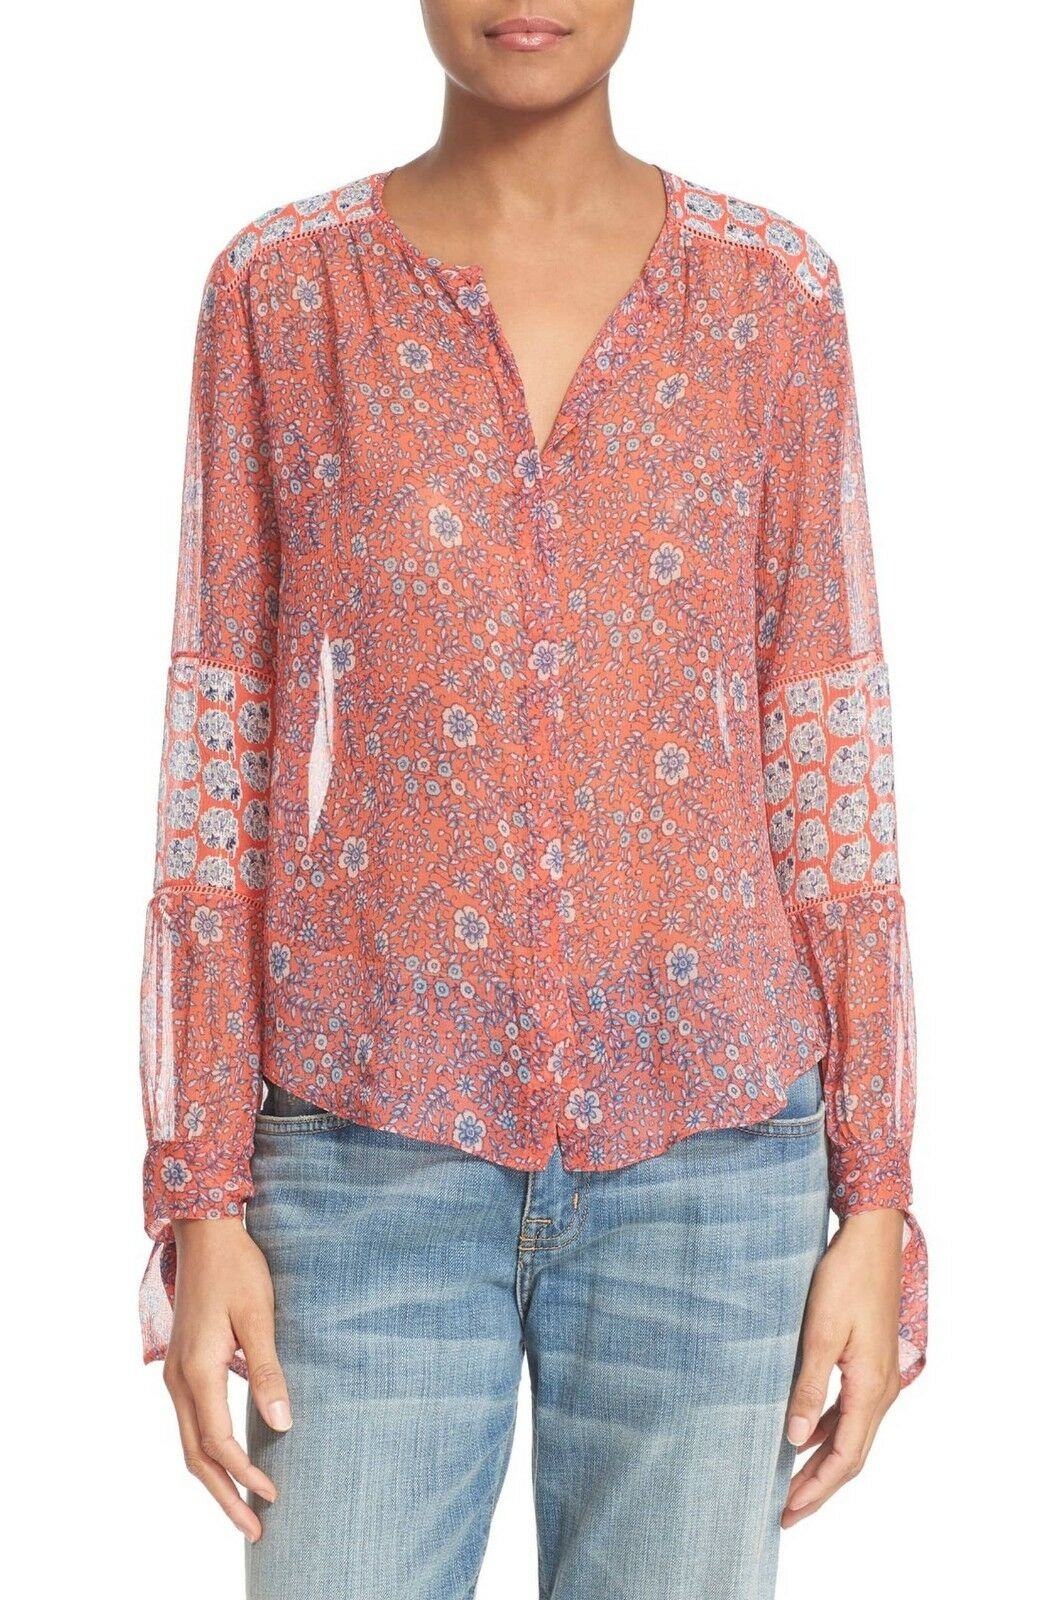 REBECCA TAYLOR Amanda Print Silk Long Sleeve Blouse Top Size 8 NWT  295